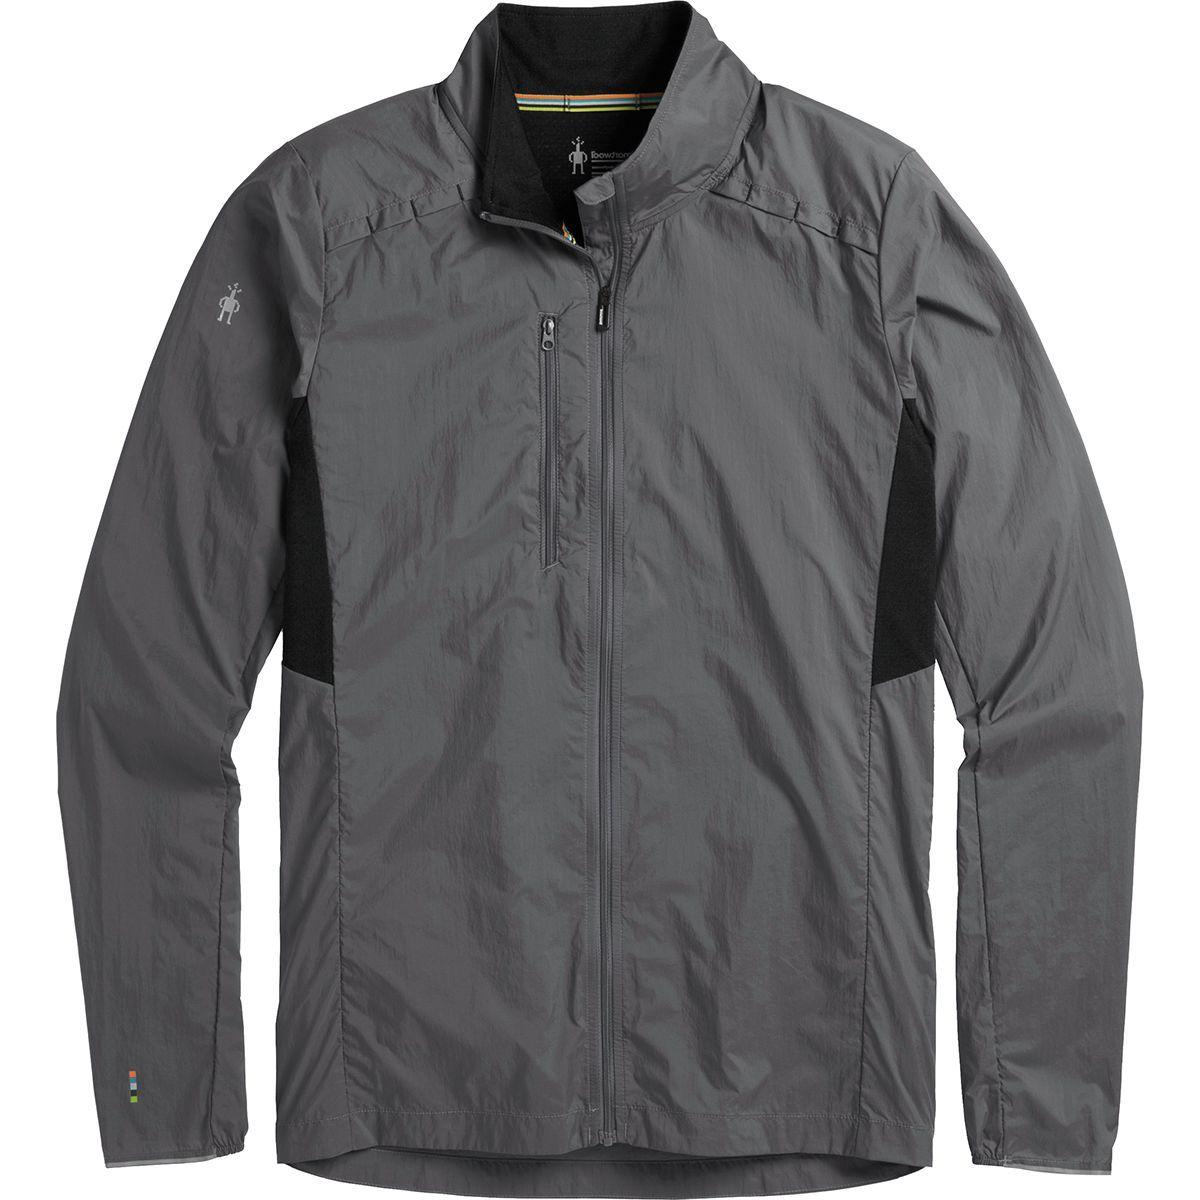 Smartwool Merino Sport Ultra Light Jacket - Men's